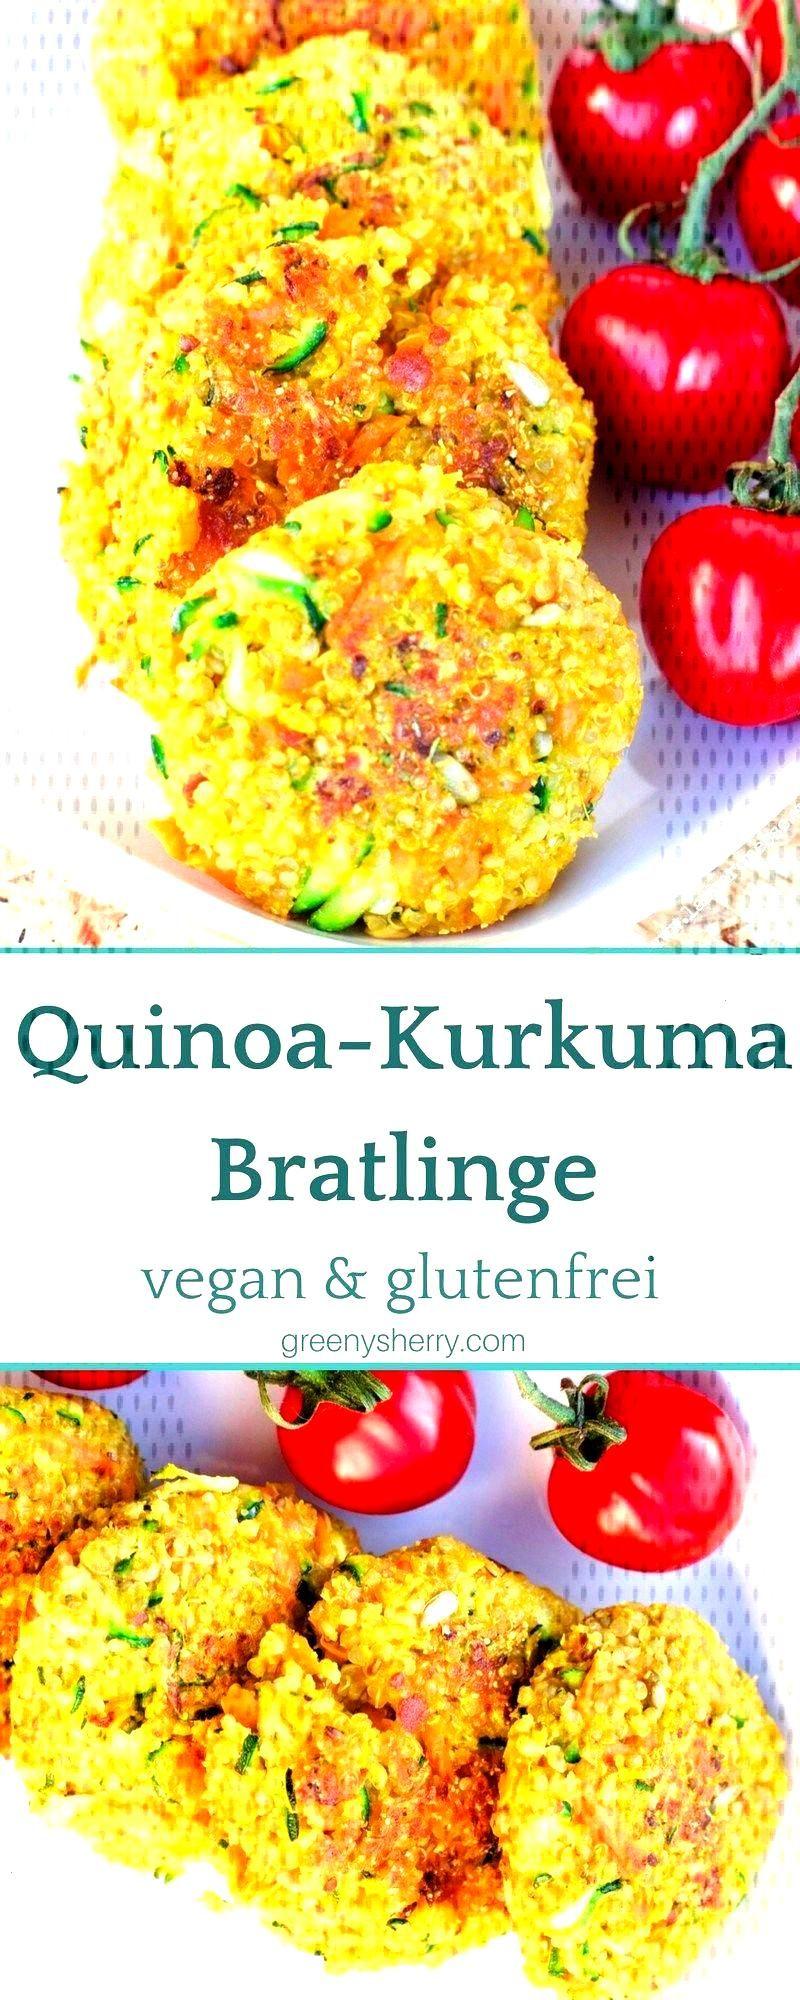 Crunchy Quinoa - Kurkuma-Pastetchen (vegan amp glutenfrei) - Greeny Sherry - Vegane Rezepte amp grünes